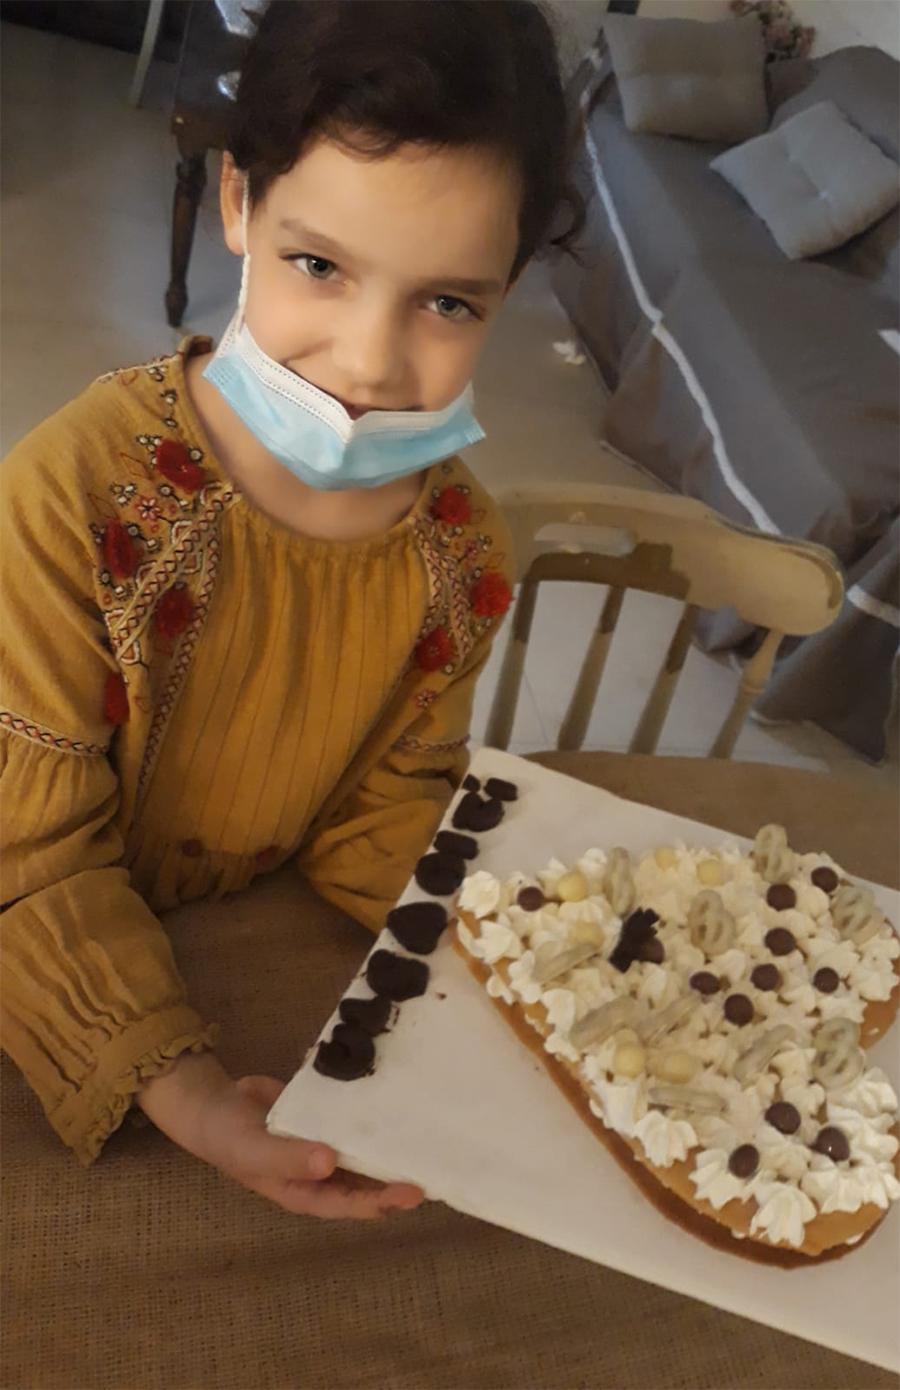 Untitled 1 6 - סדנאות אפיה ילדות -עוגת מספרים